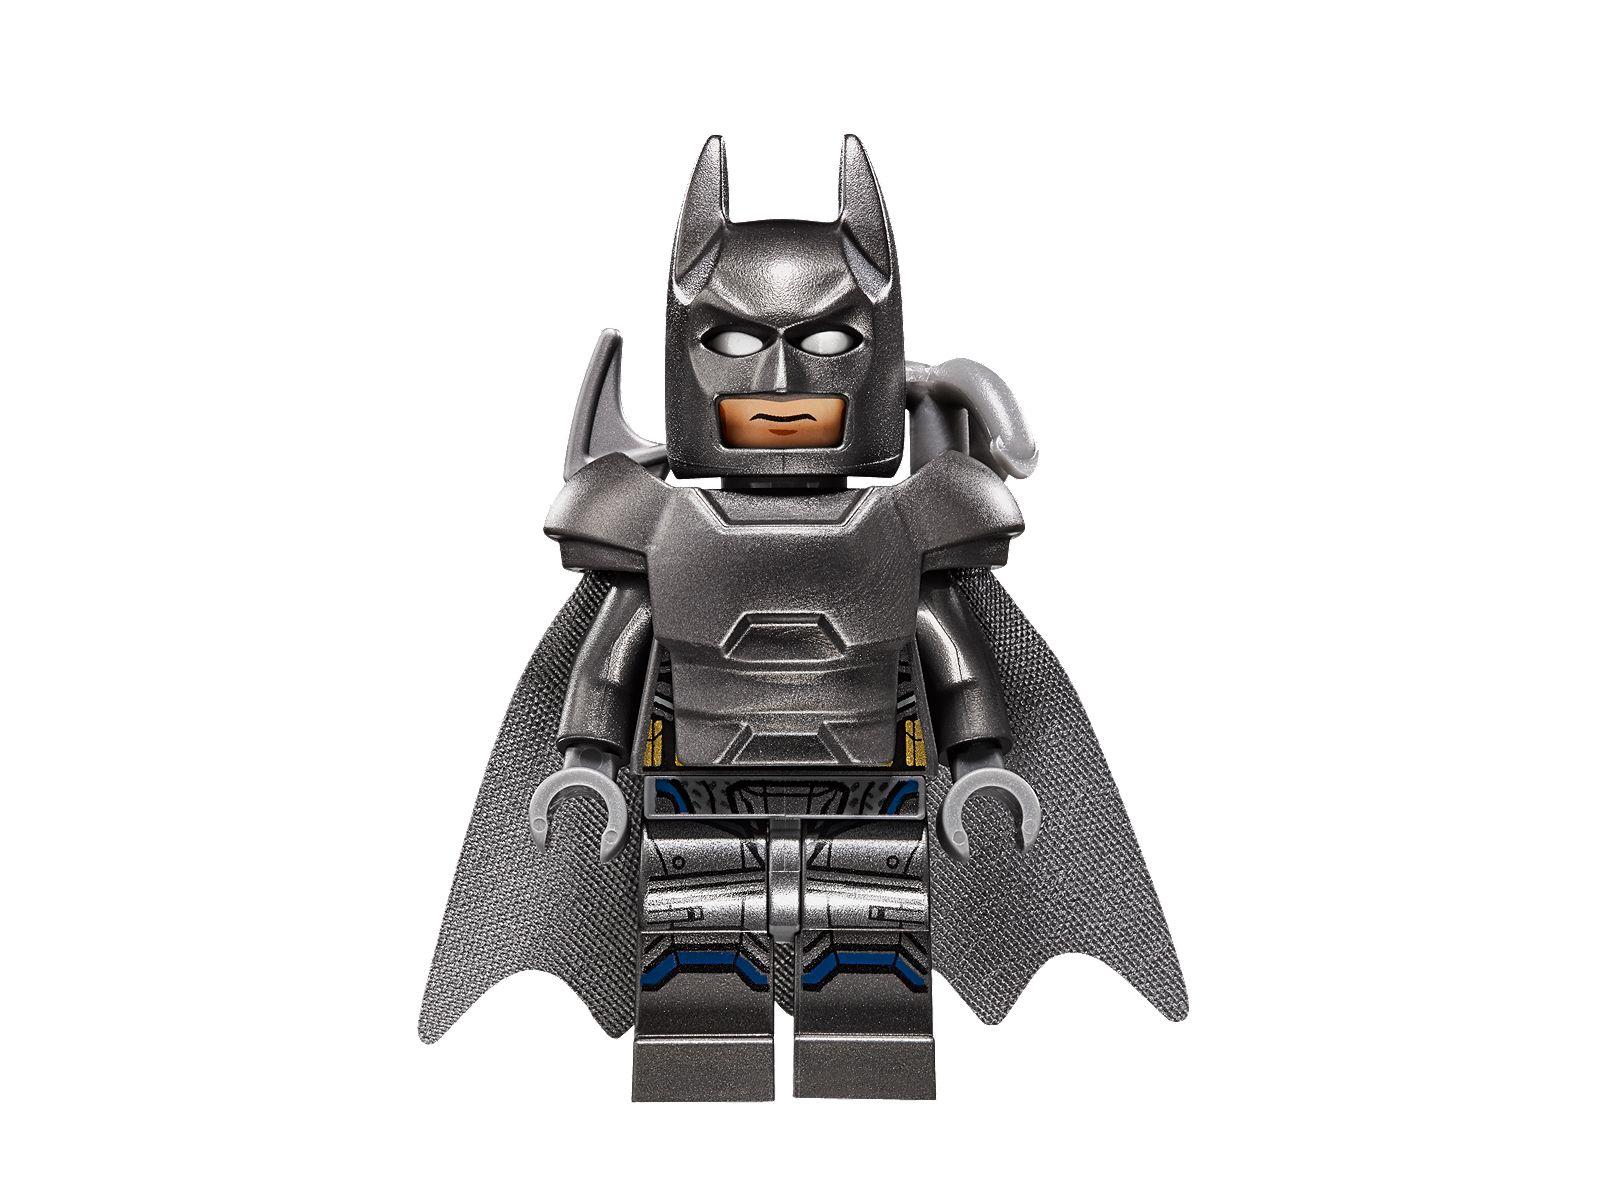 Lego Web Site Posted Official Images of Batman V Superman ...